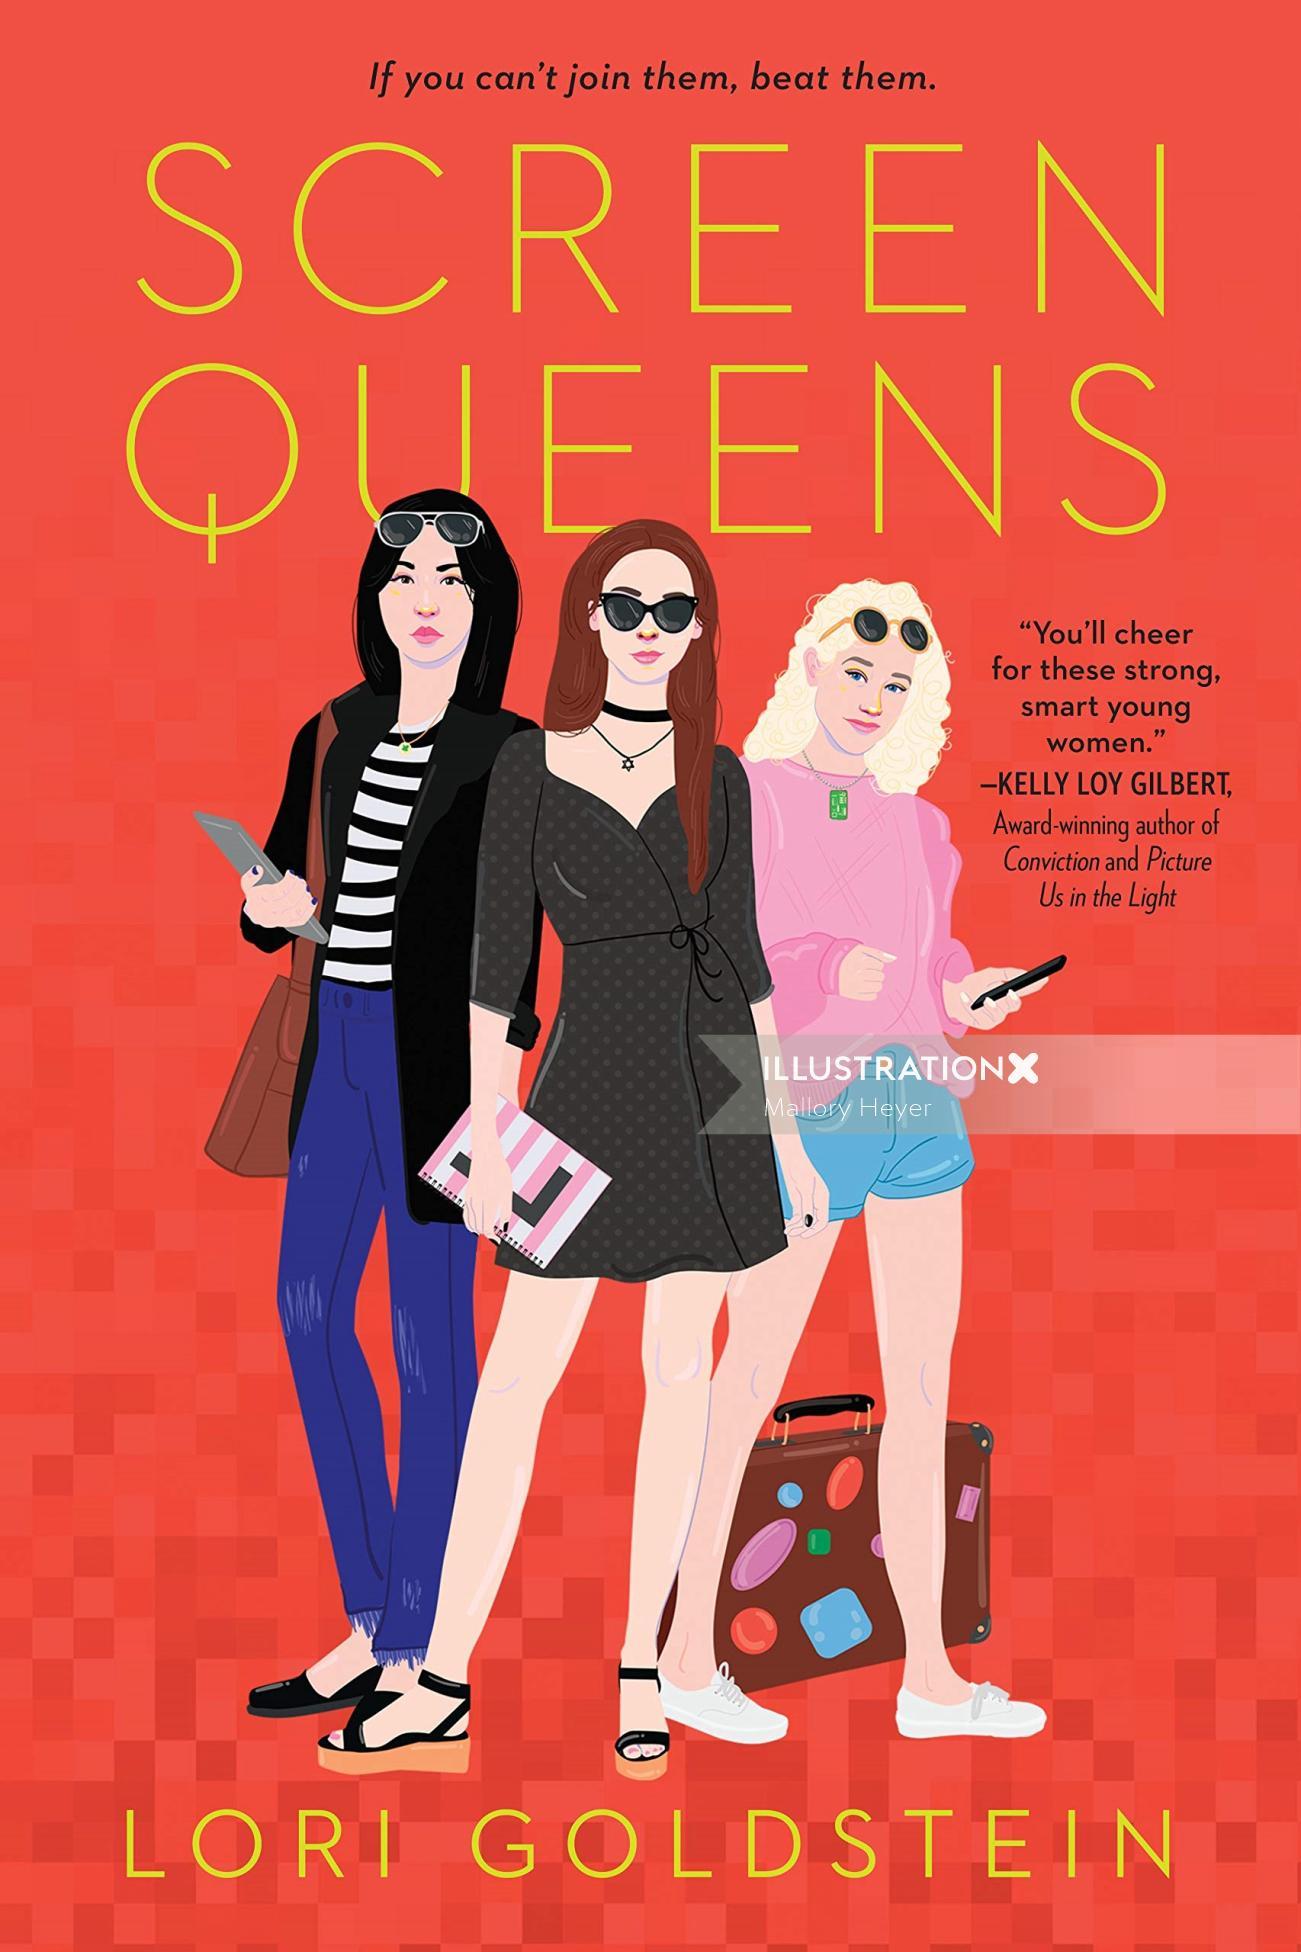 Editorial screen queens cover